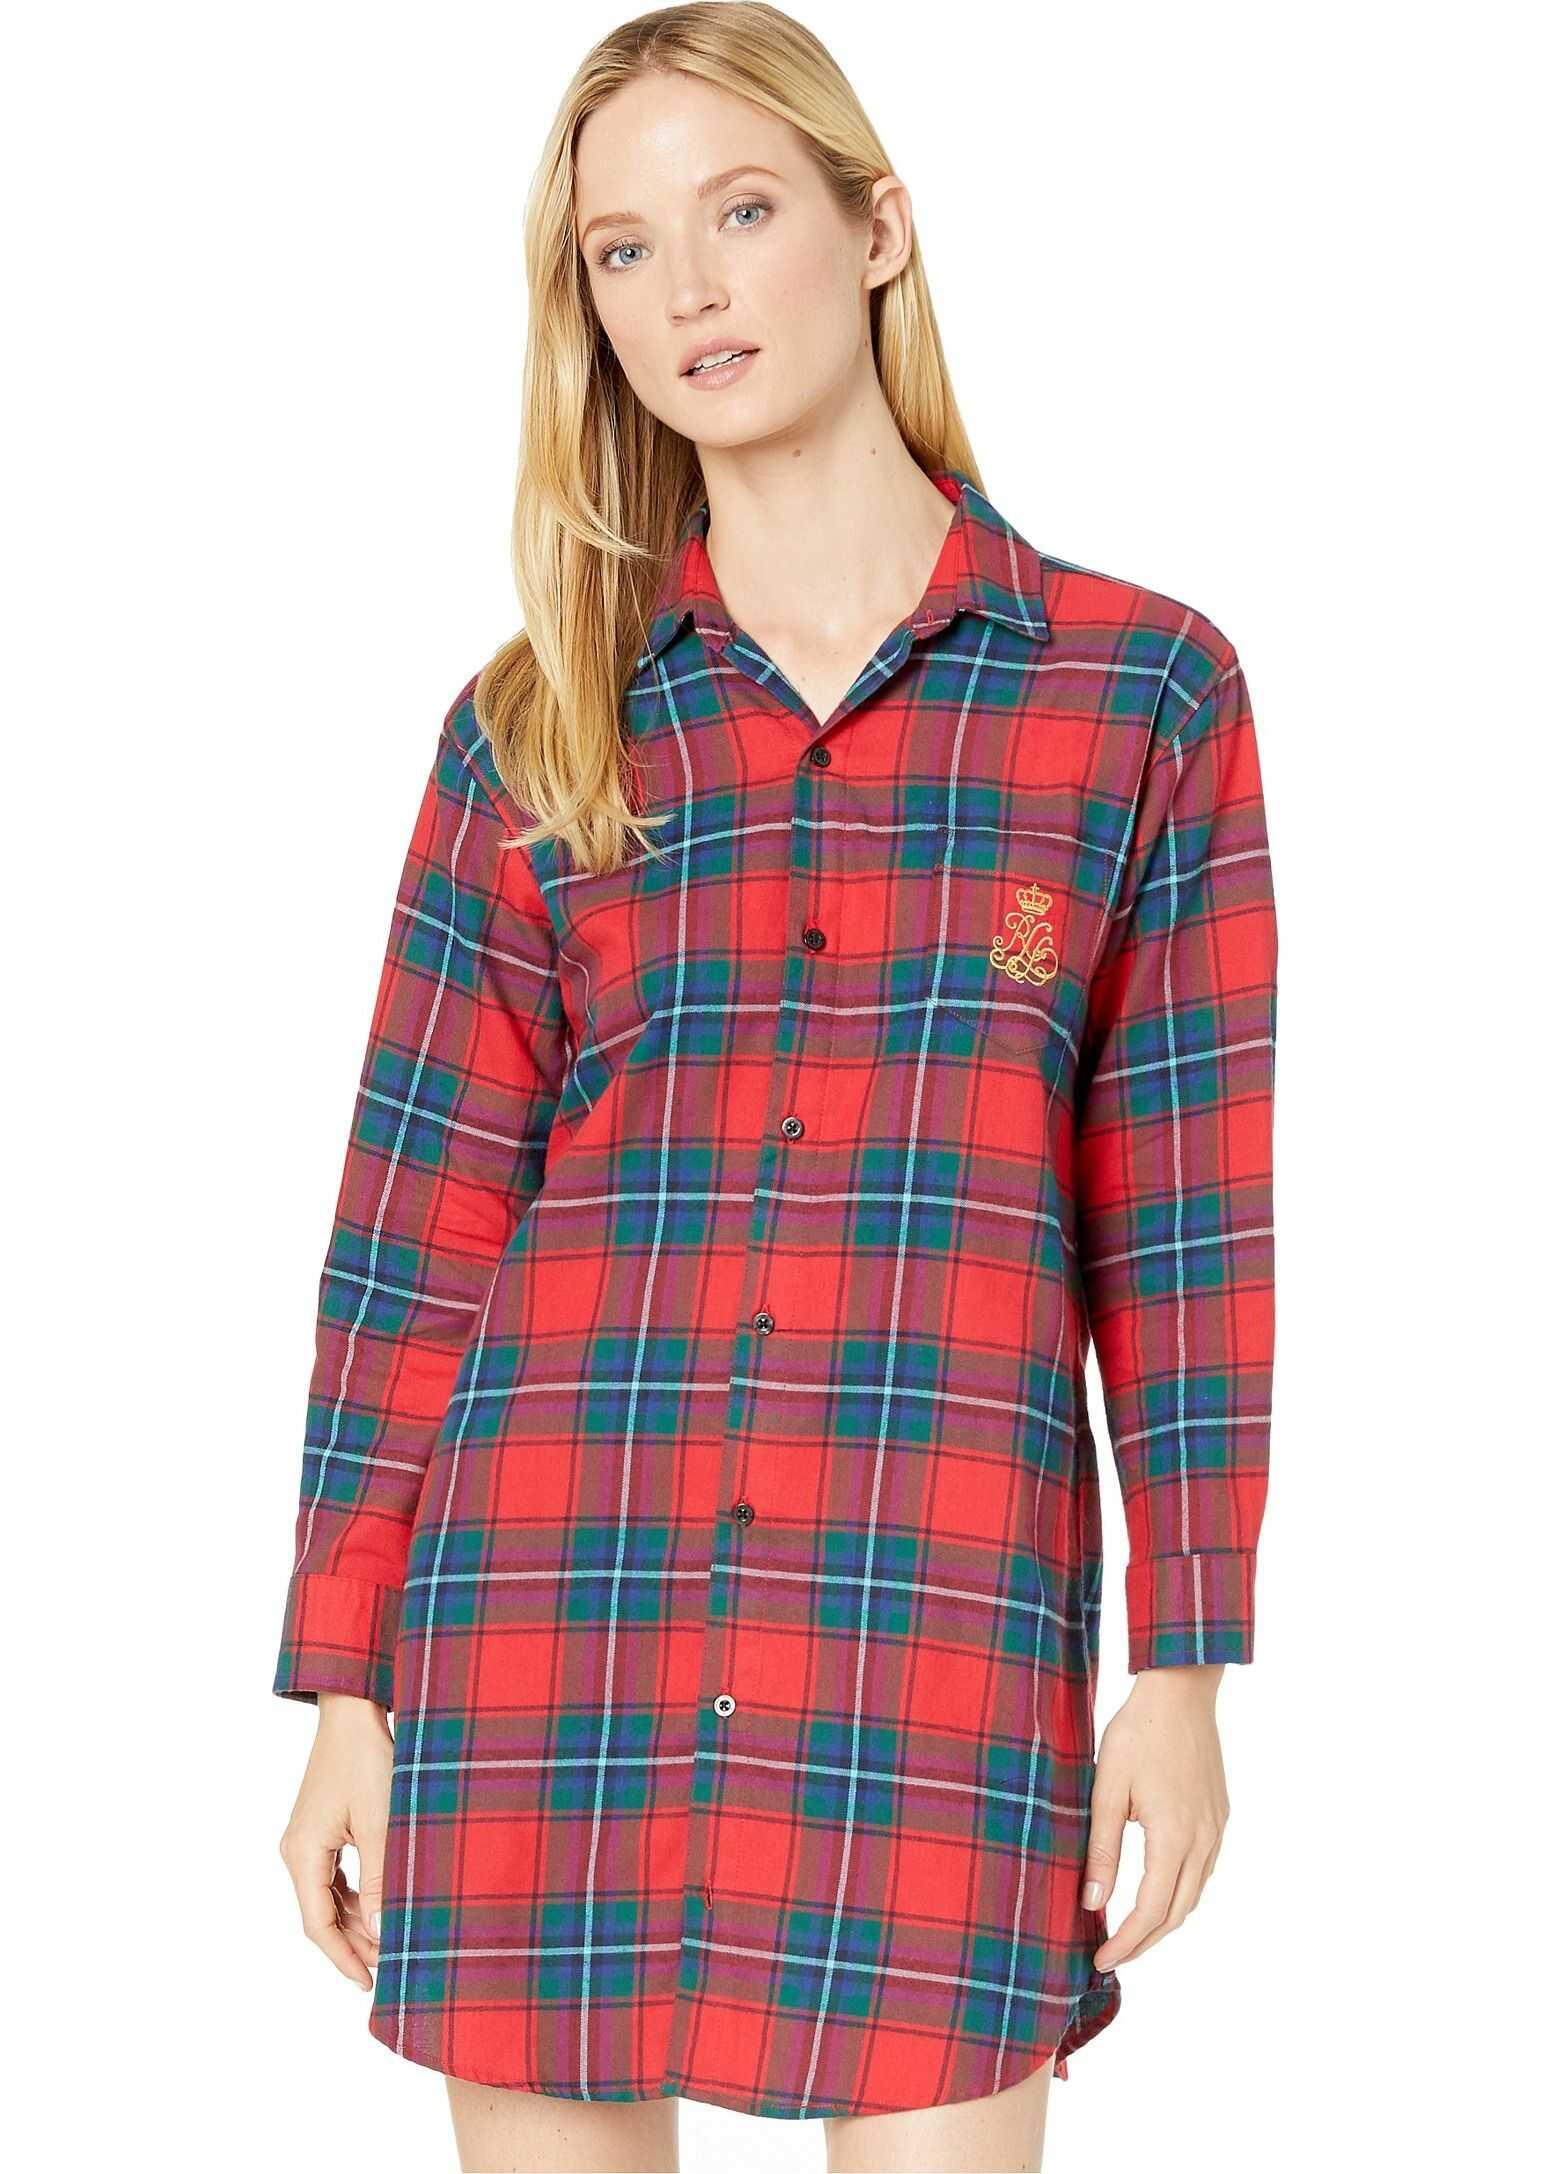 Ralph Lauren Brushed Twill Long Sleeve His Shirt Sleepshirt Red Plaid